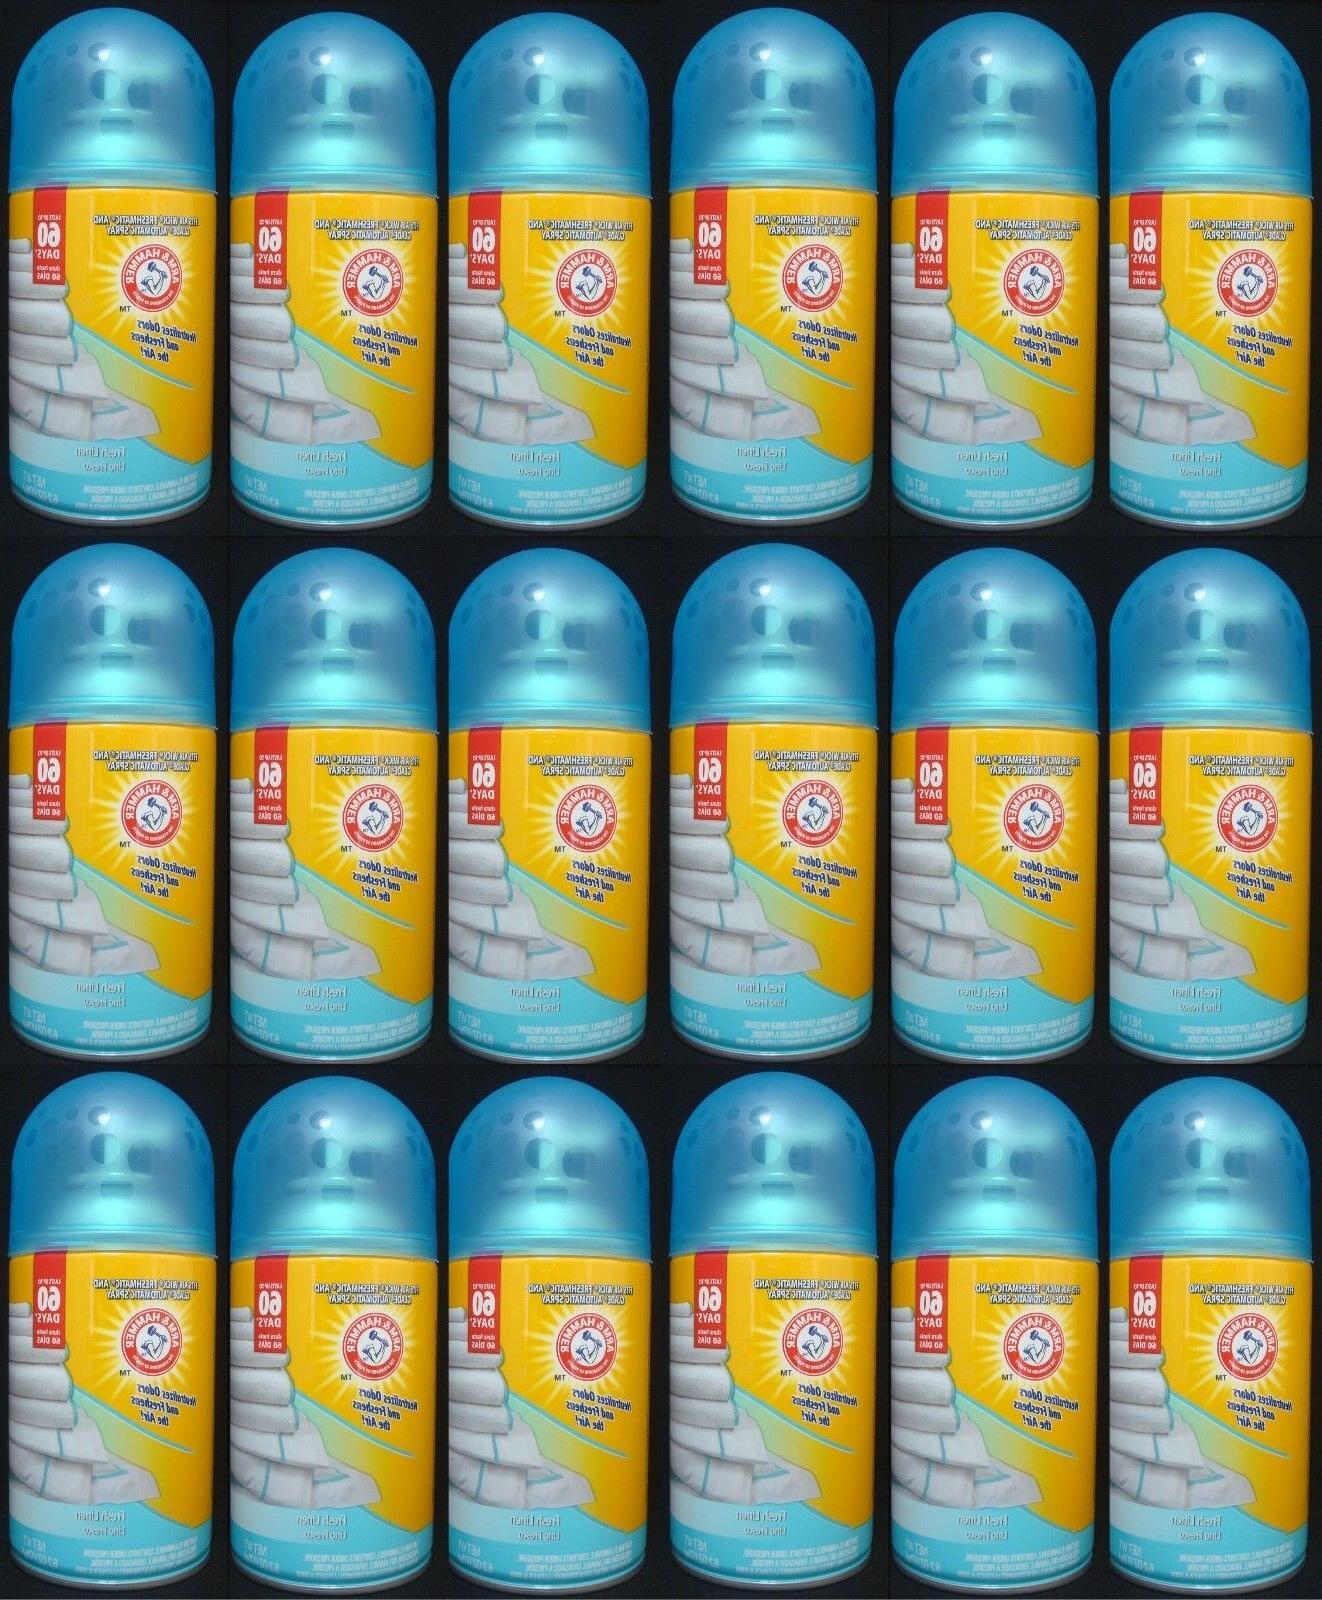 18 Arm & Hammer Fits Air Wick Freshmatic & Glade Spray Refil